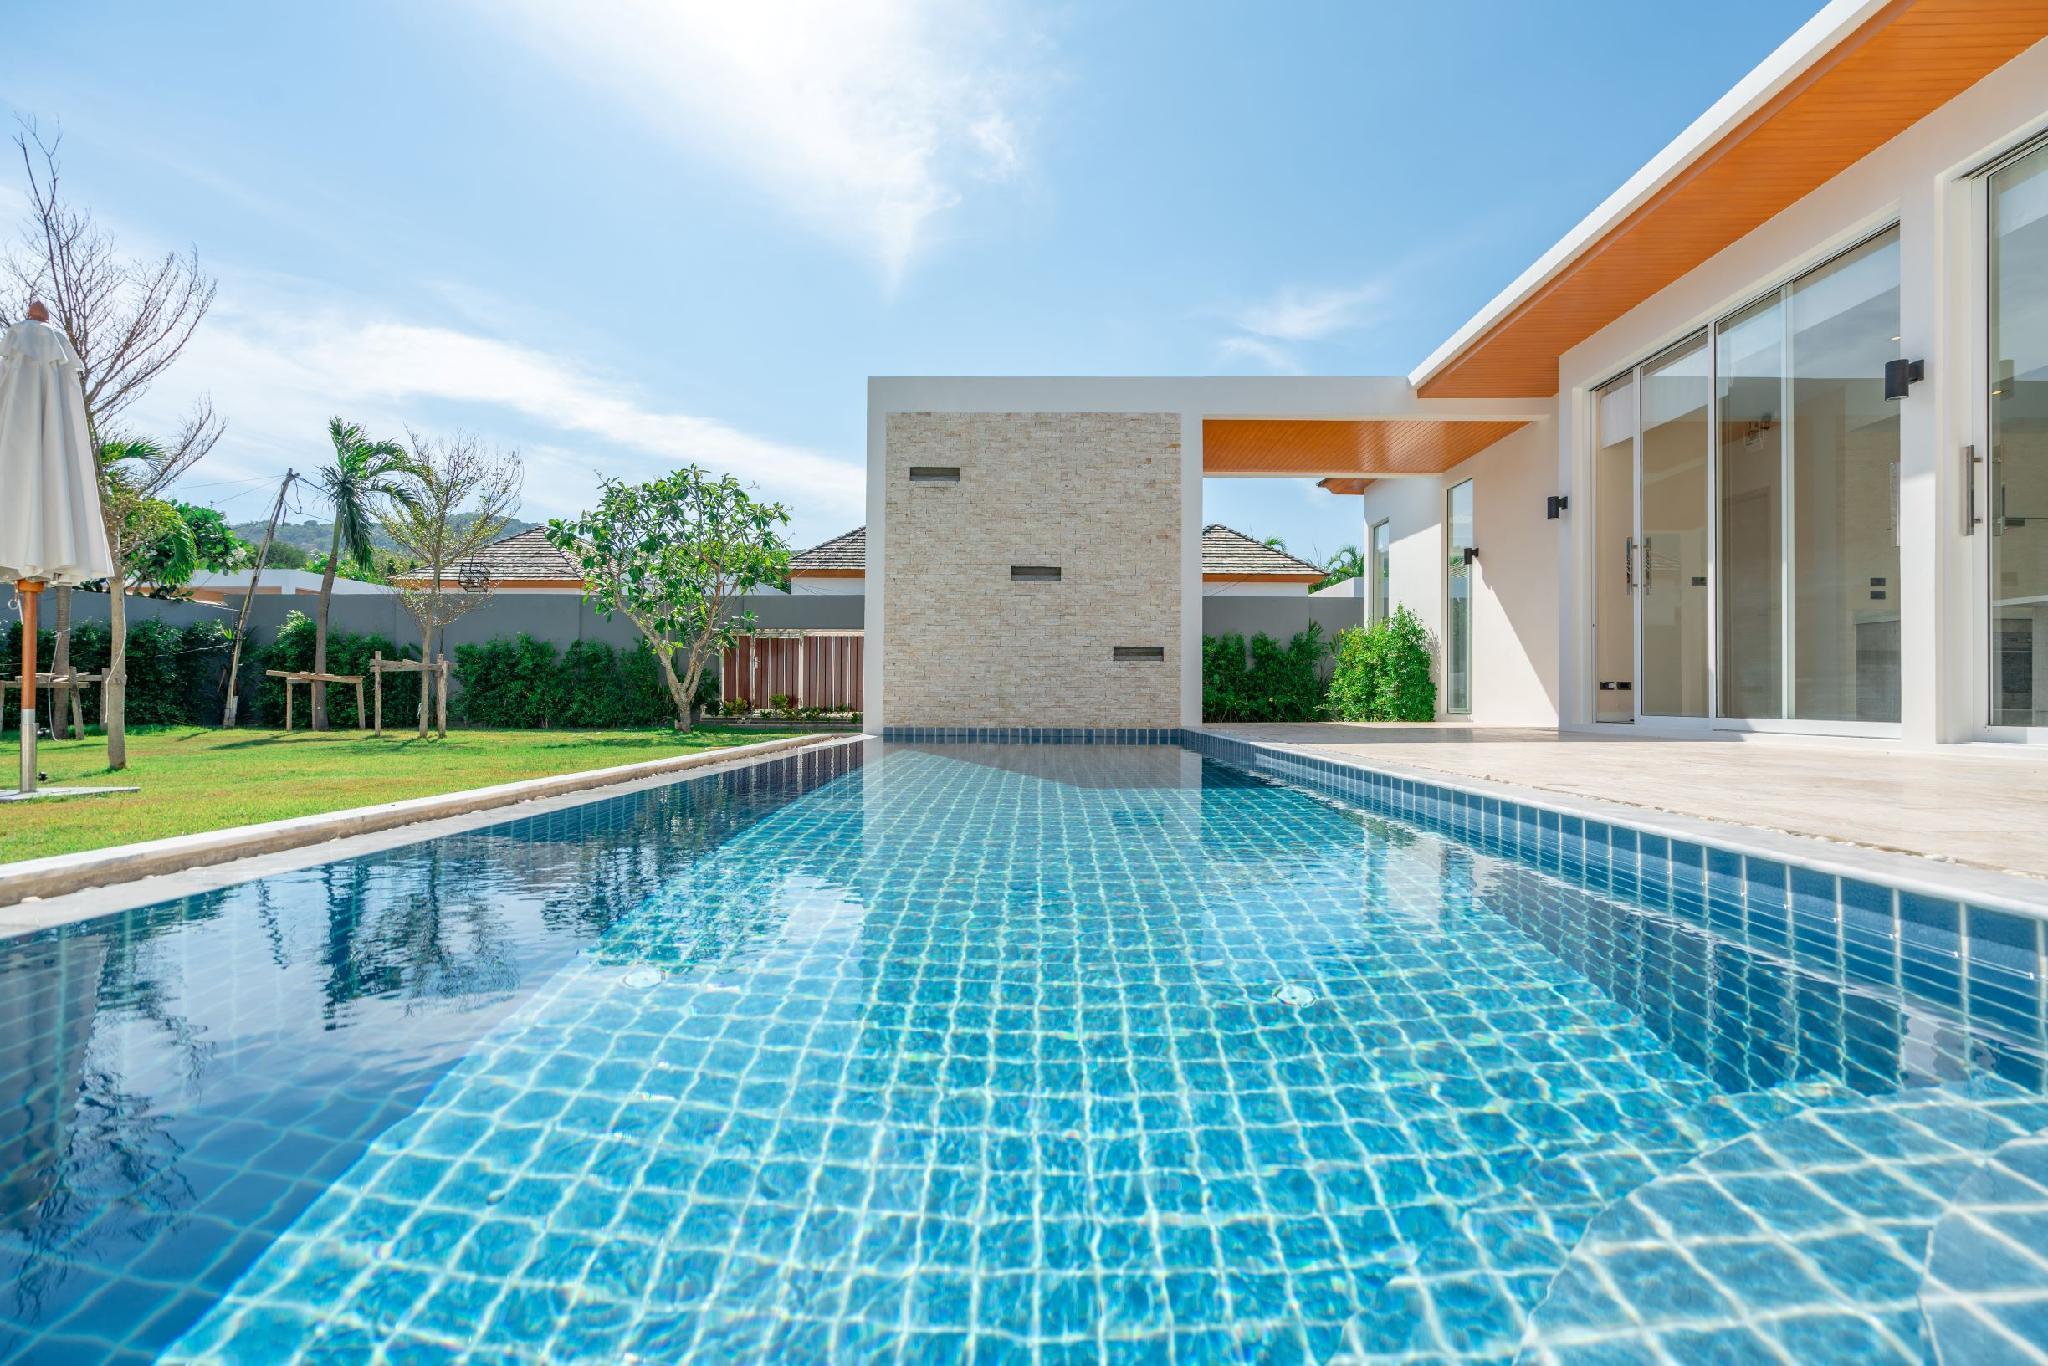 4 BDR Spacious Family Pool Villa Naiharn Phuket วิลลา 4 ห้องนอน 4 ห้องน้ำส่วนตัว ขนาด 340 ตร.ม. – ในหาน